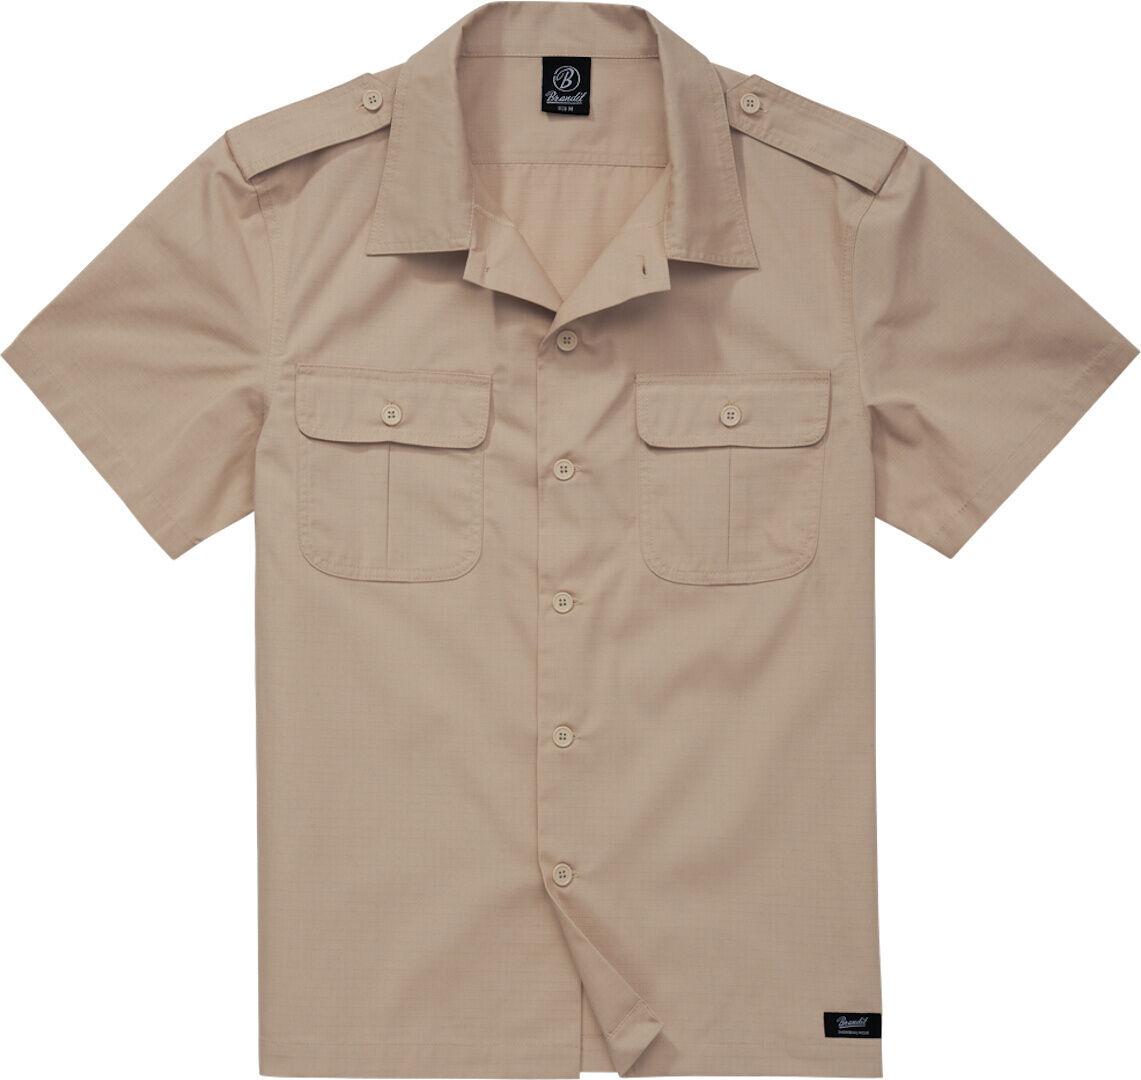 Brandit US Ripstop Paita  - Beige - Size: 3XL